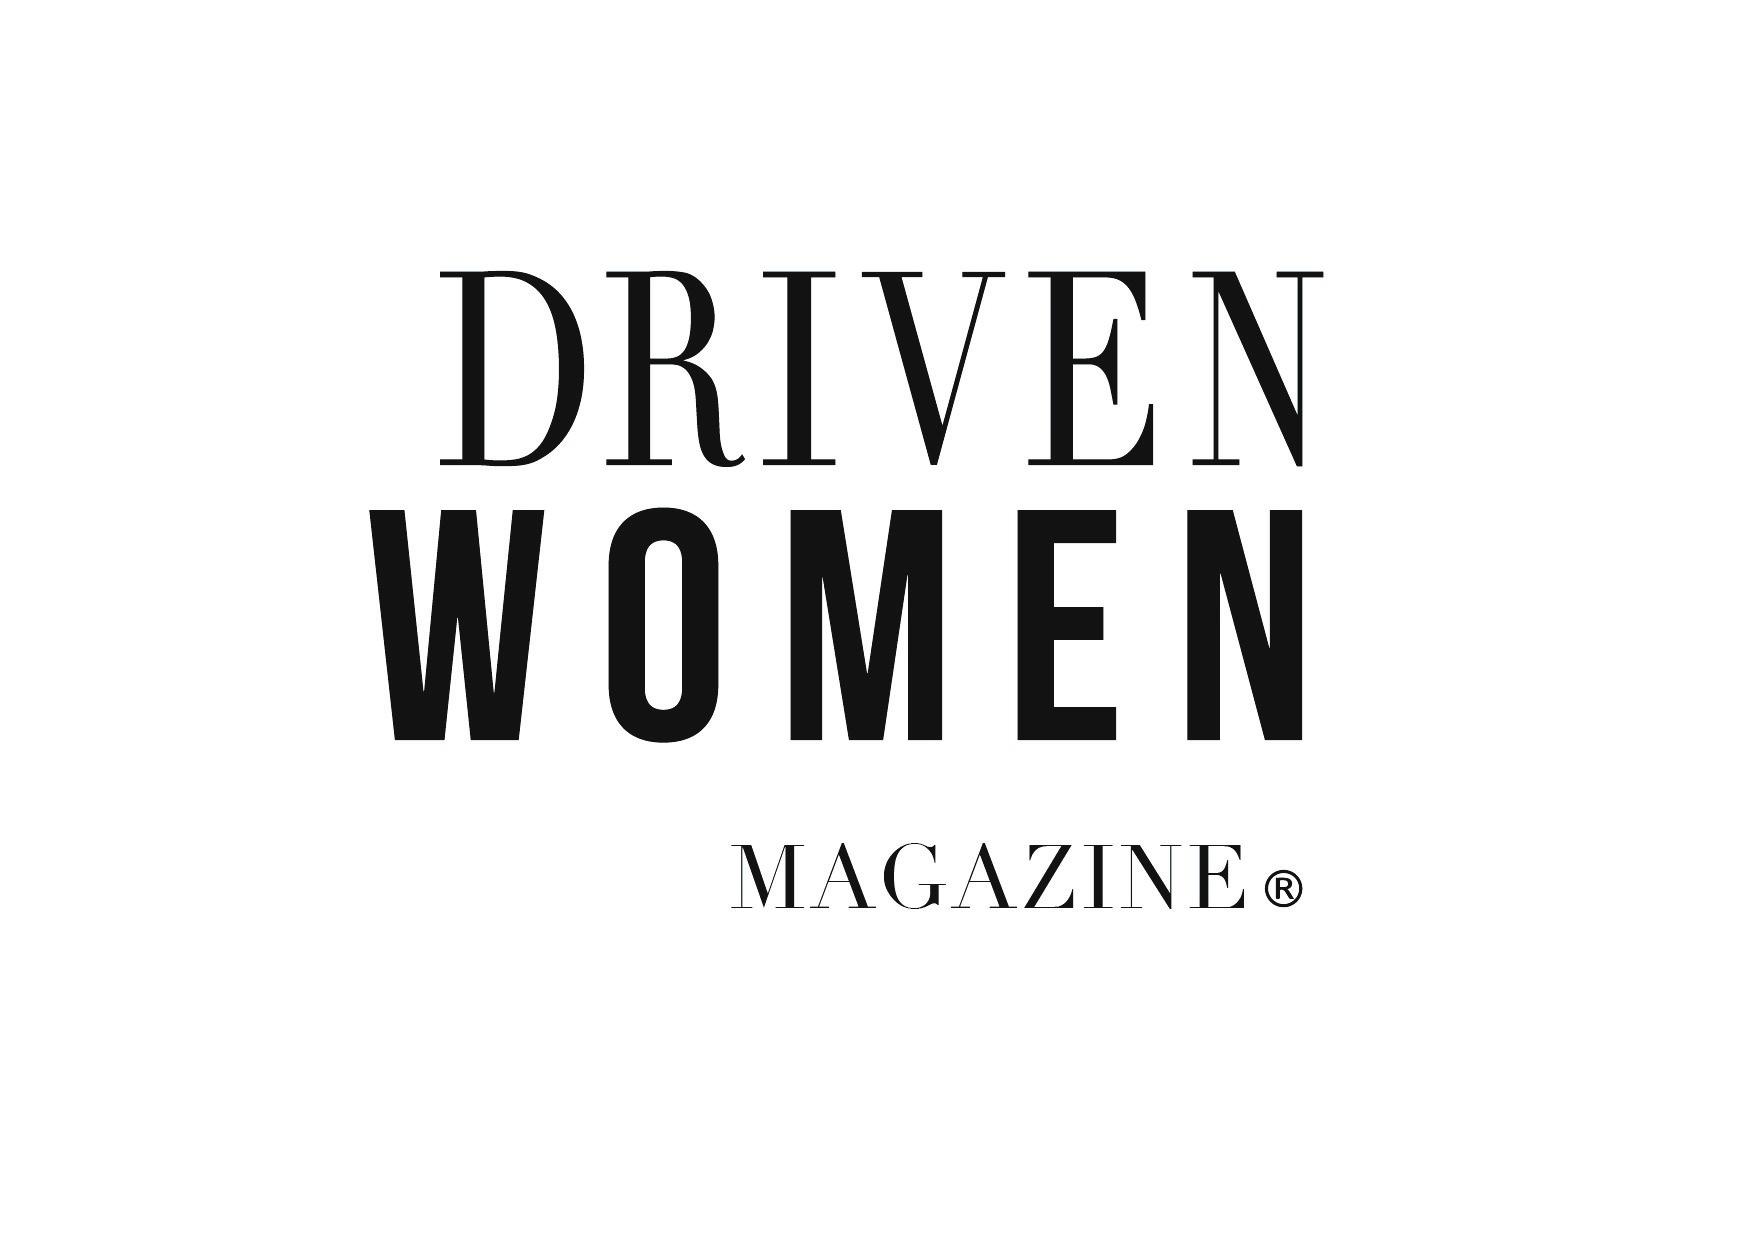 driven woman magazine.jpg